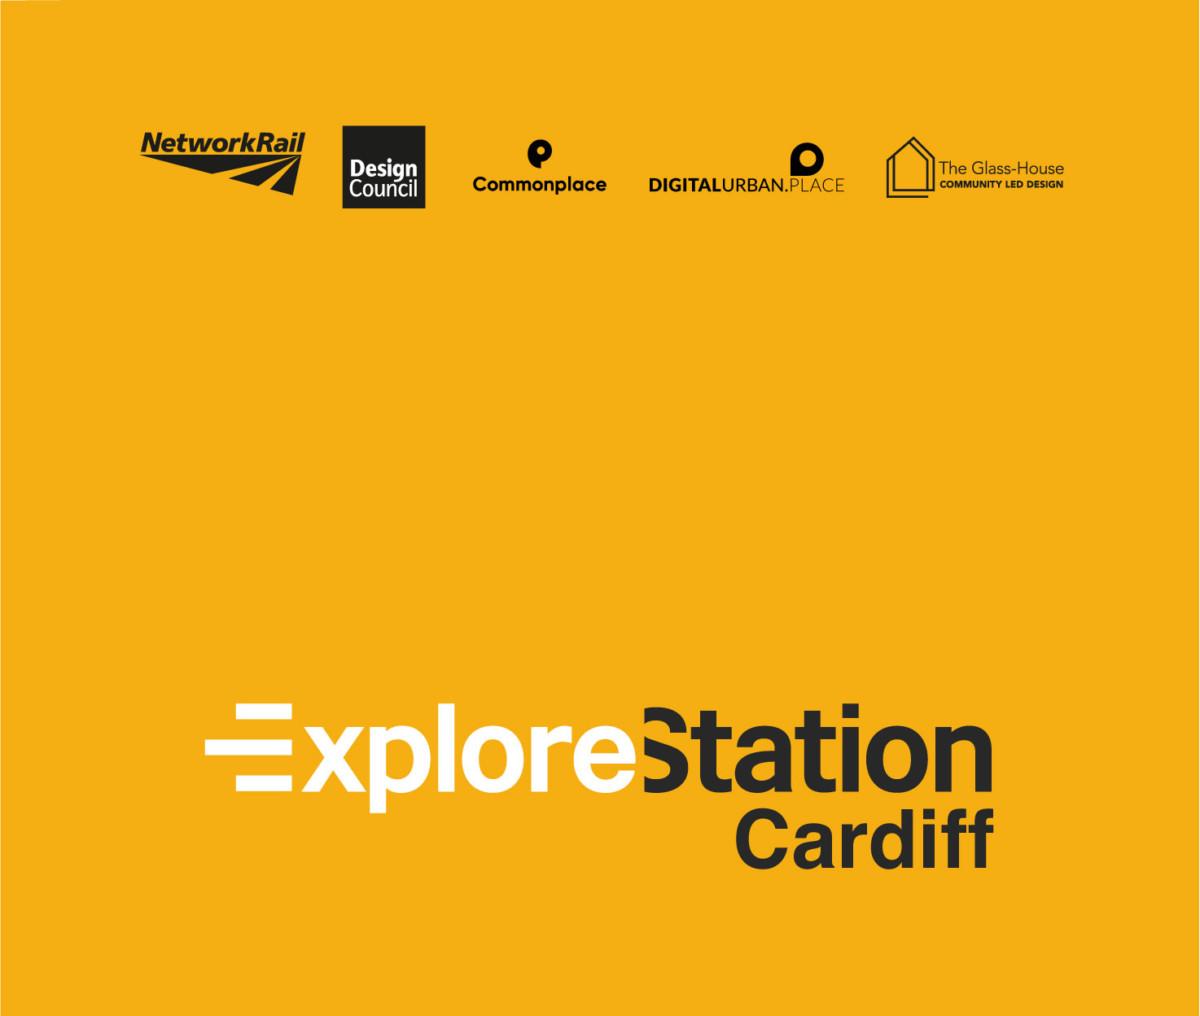 ExploreStation: Cardiff Exhibition and Workshop